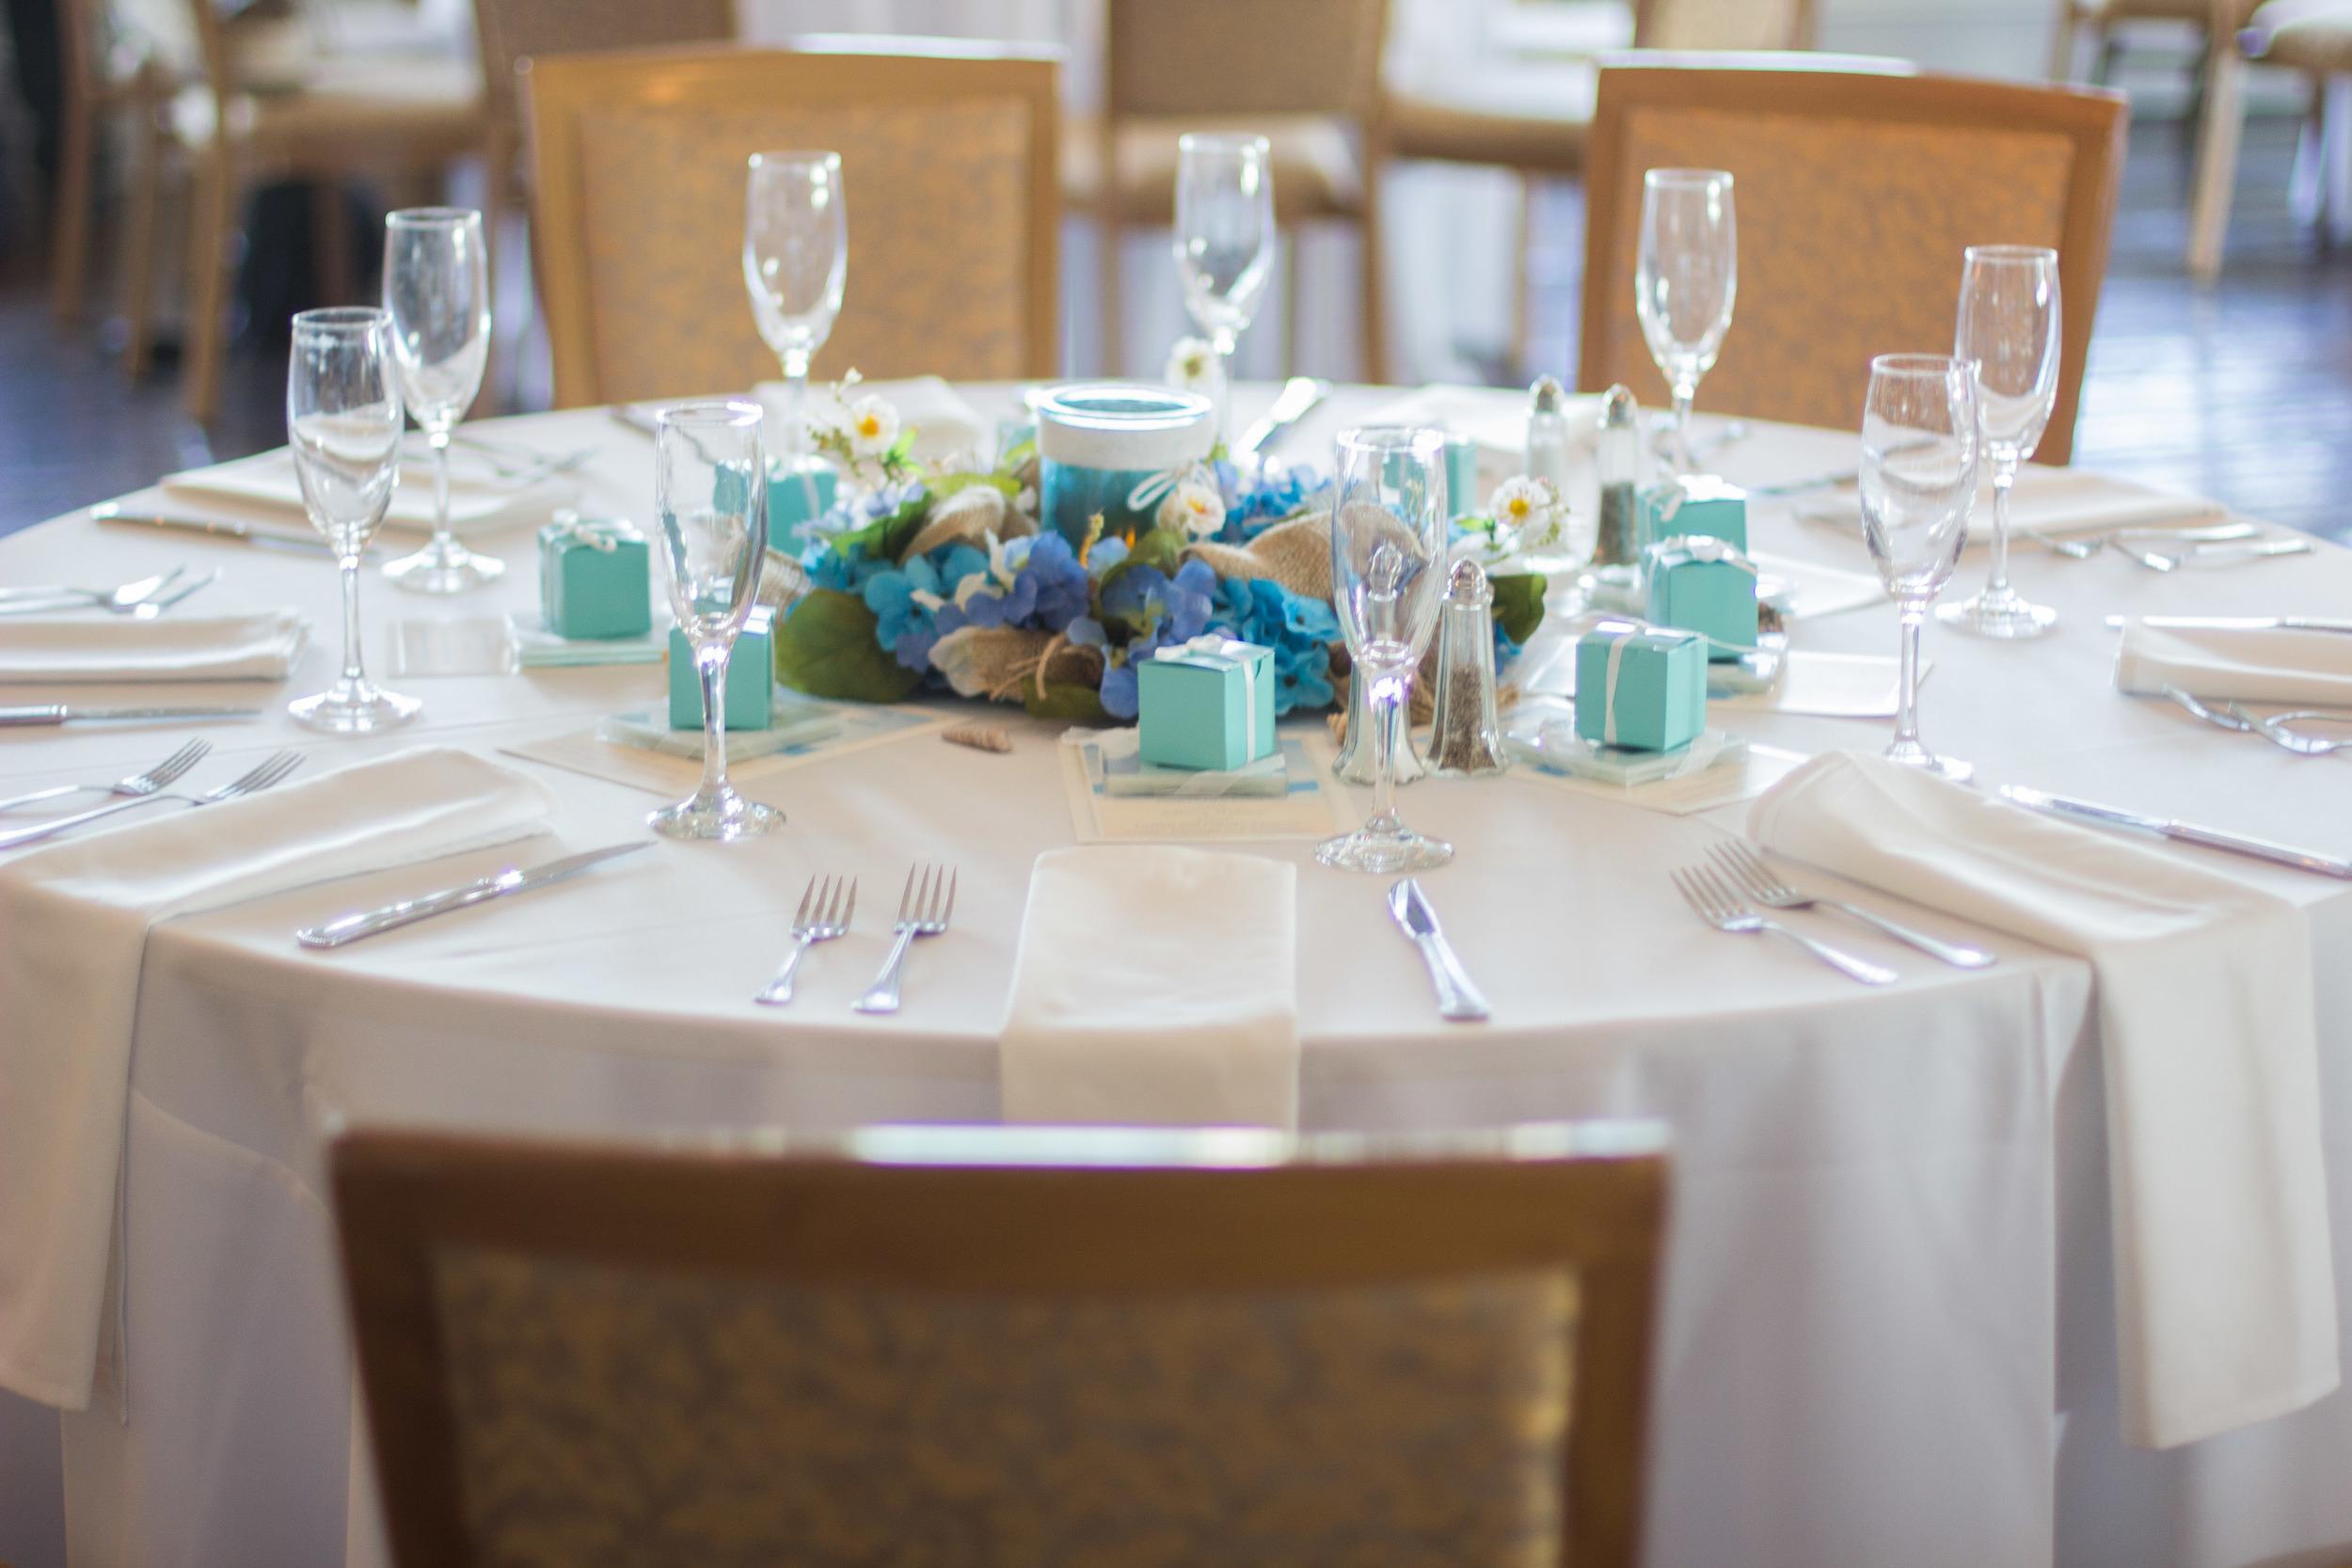 Table Setting Rustic Aqua Sea Wedding Decor | Martinsborough Wedding Reception - Greenville NC | Bryant Tyson Photography